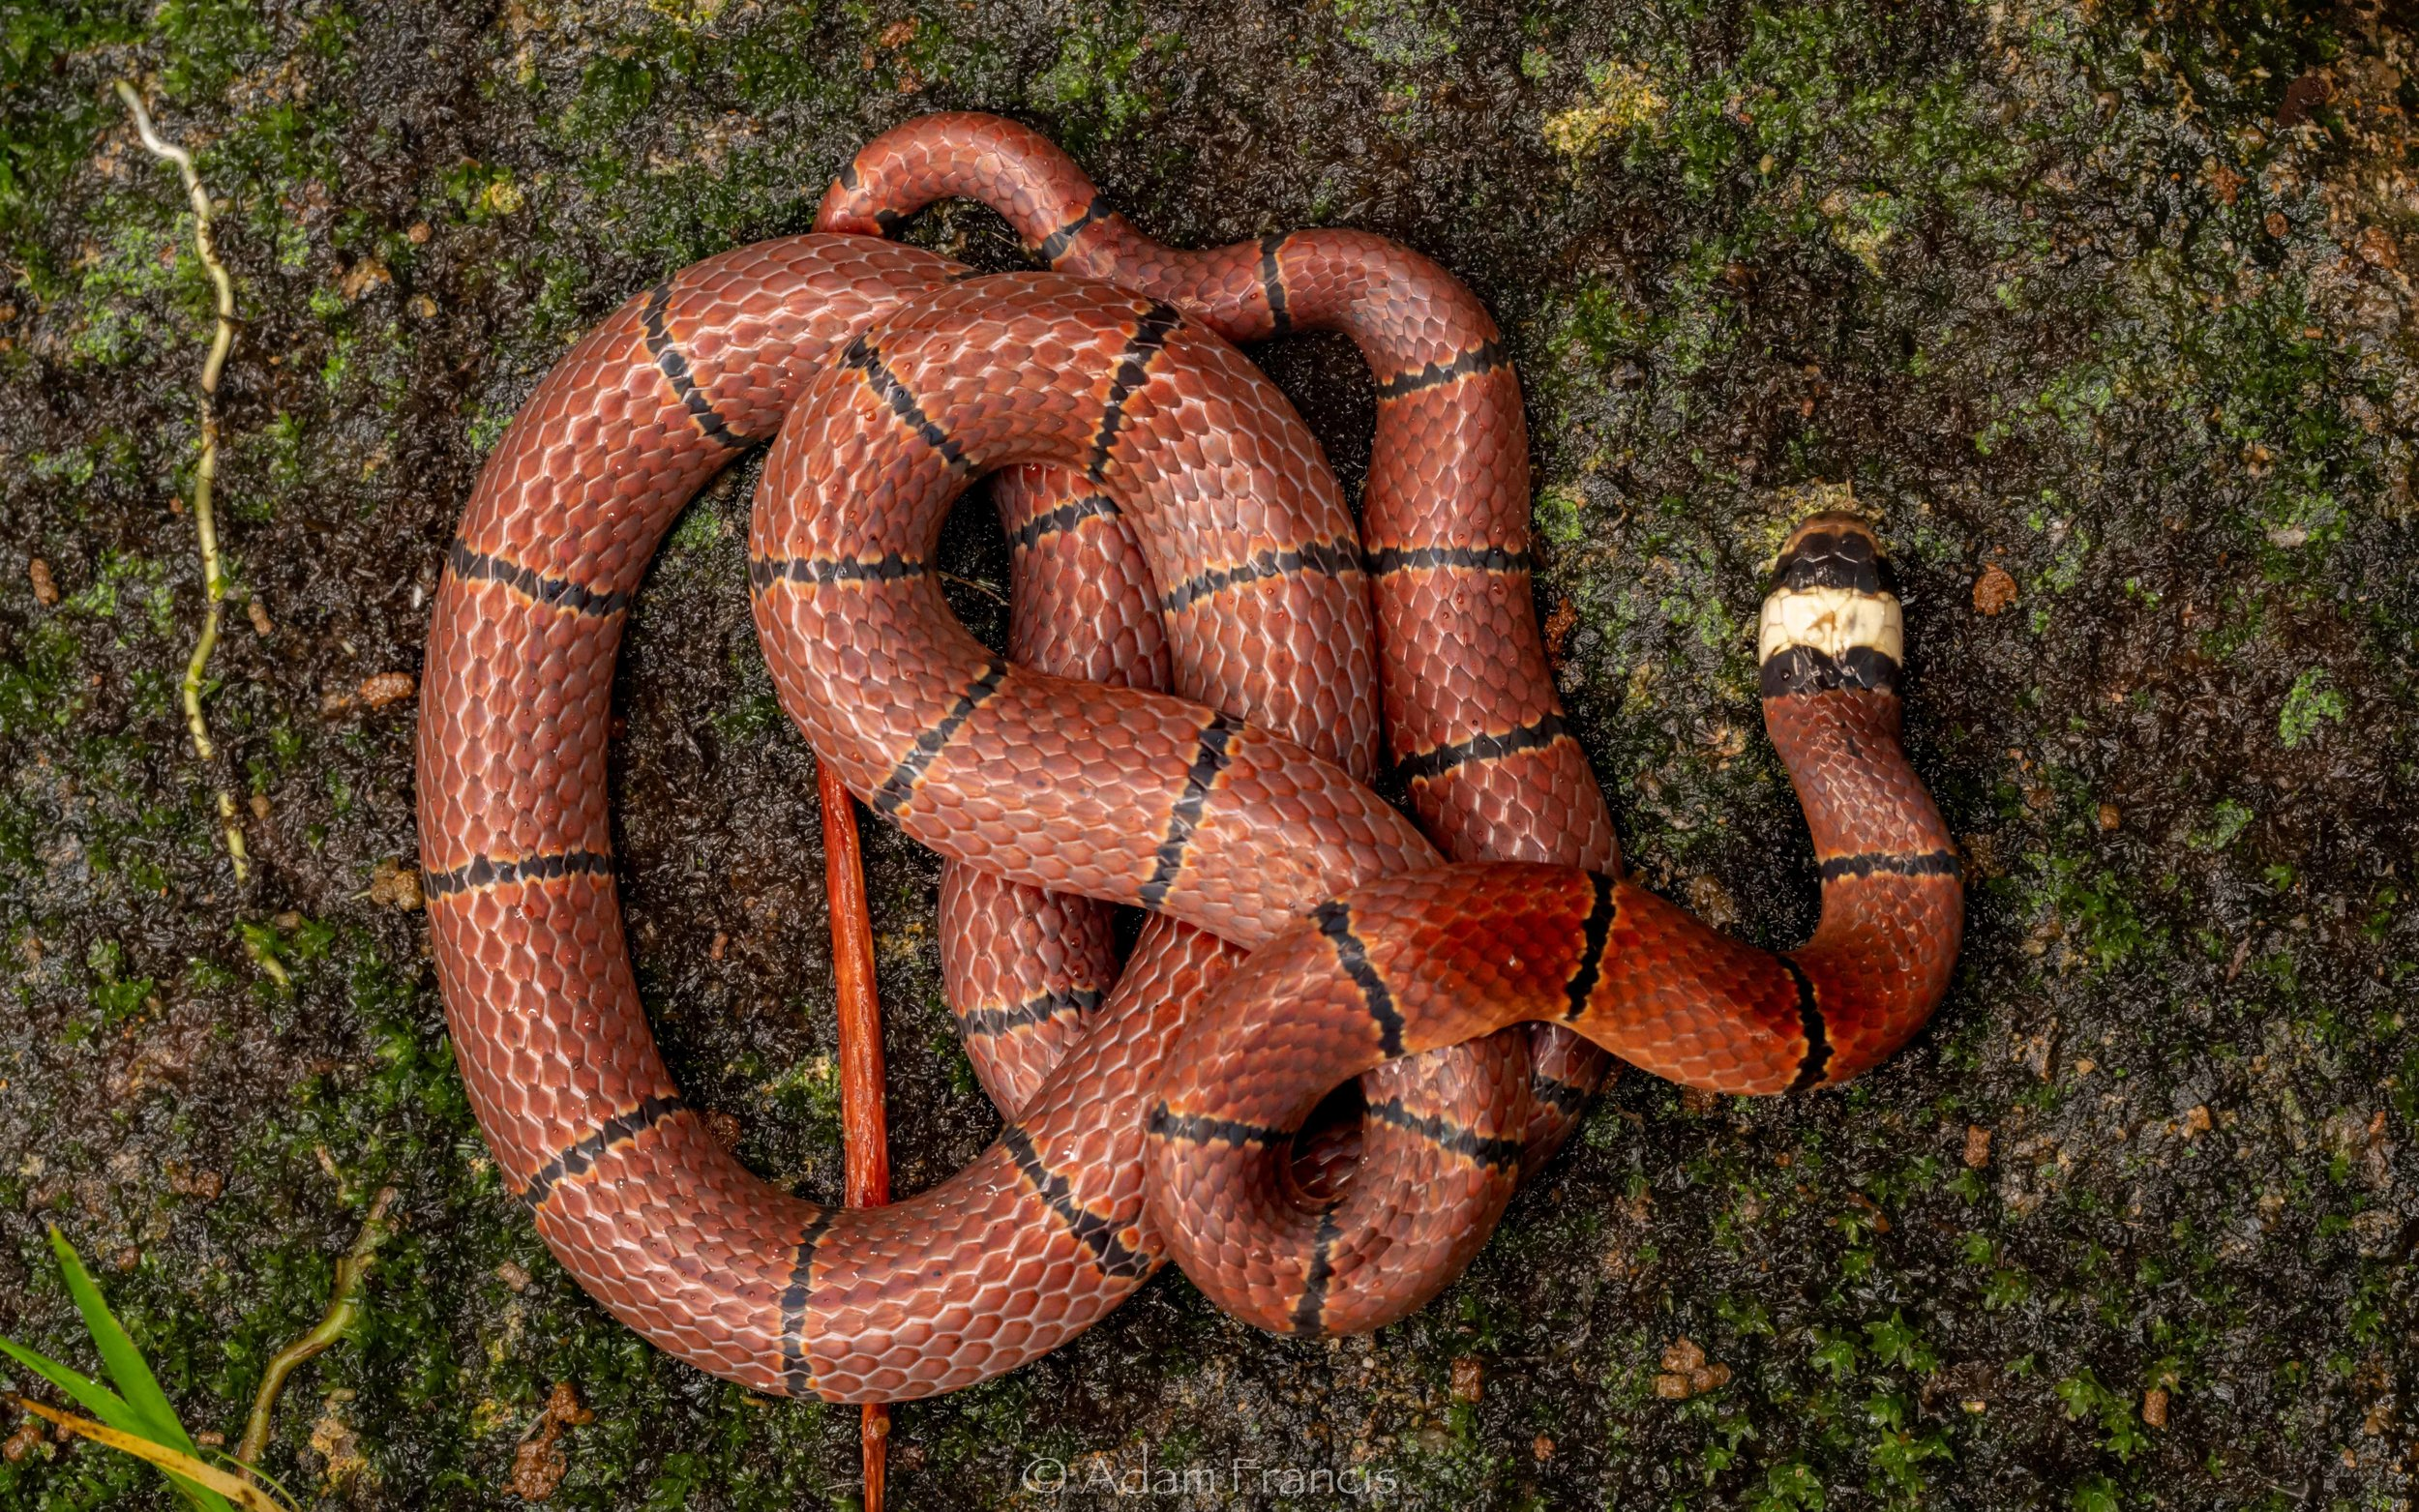 McClelland's Coral Snake - Sinomicrurus macclellandi